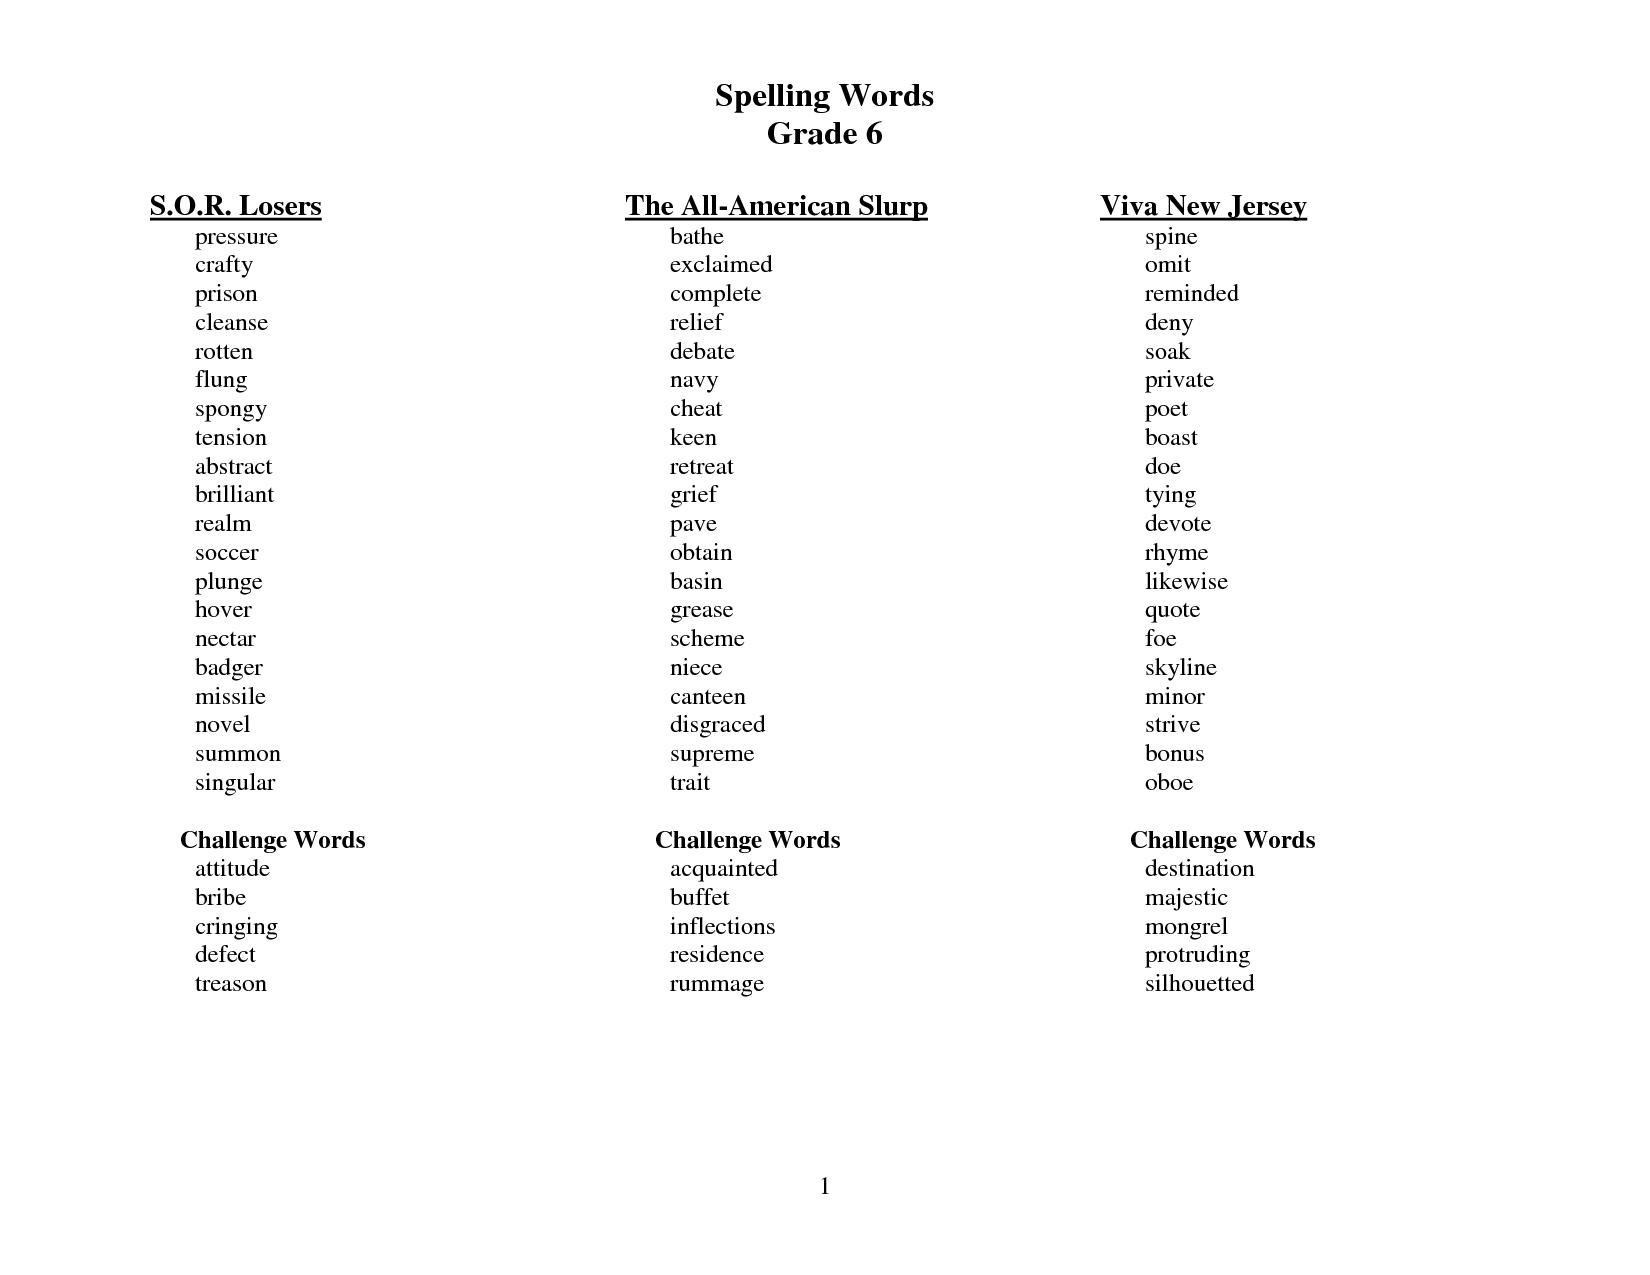 Sitton Spelling 4th Grade Worksheets